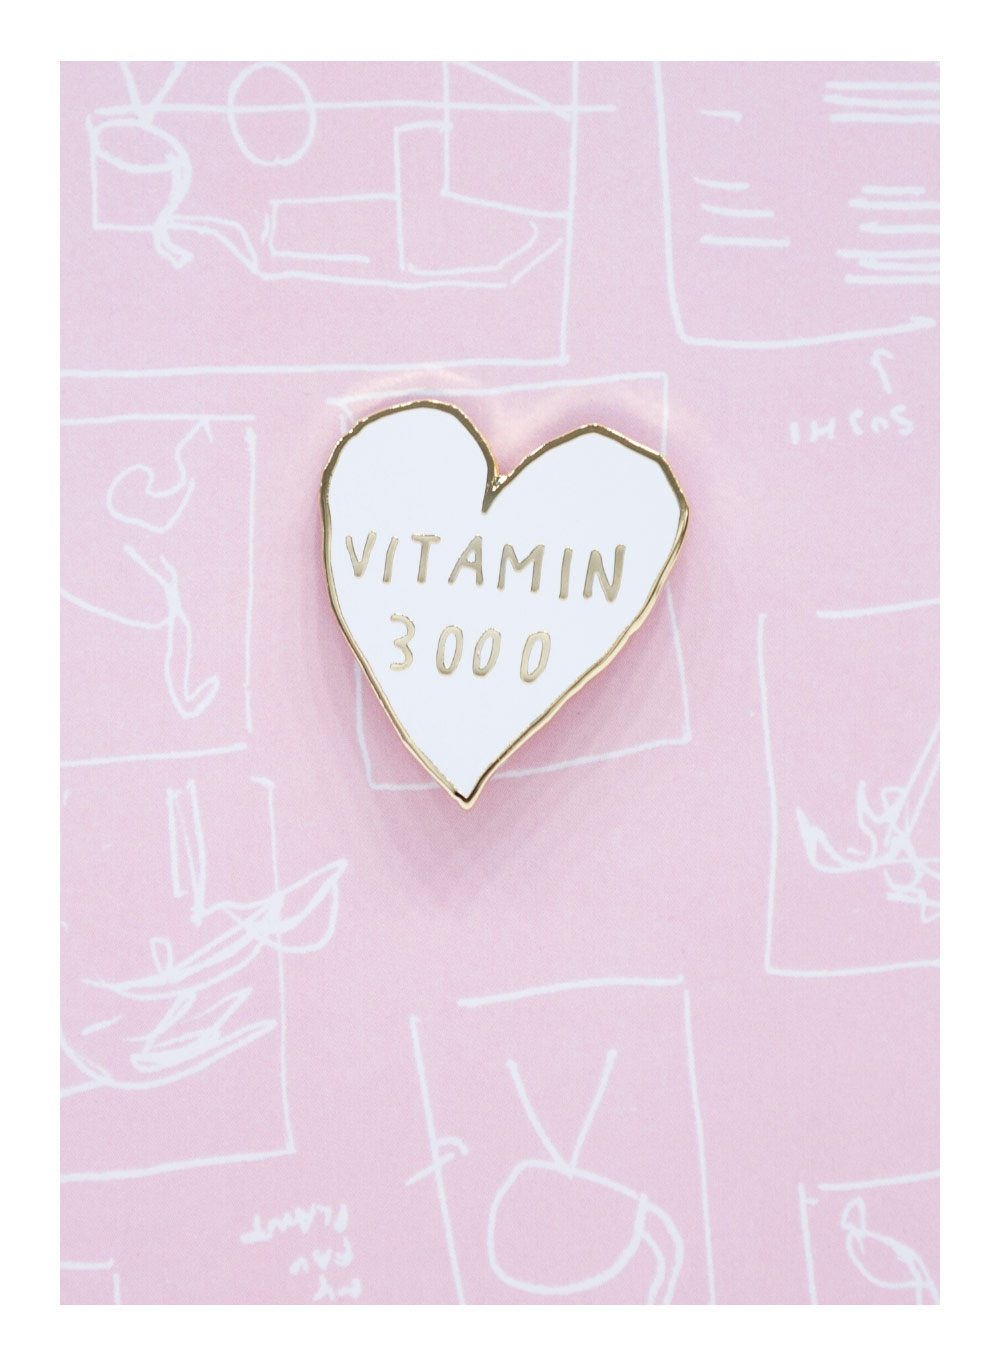 VITAMIN 3000